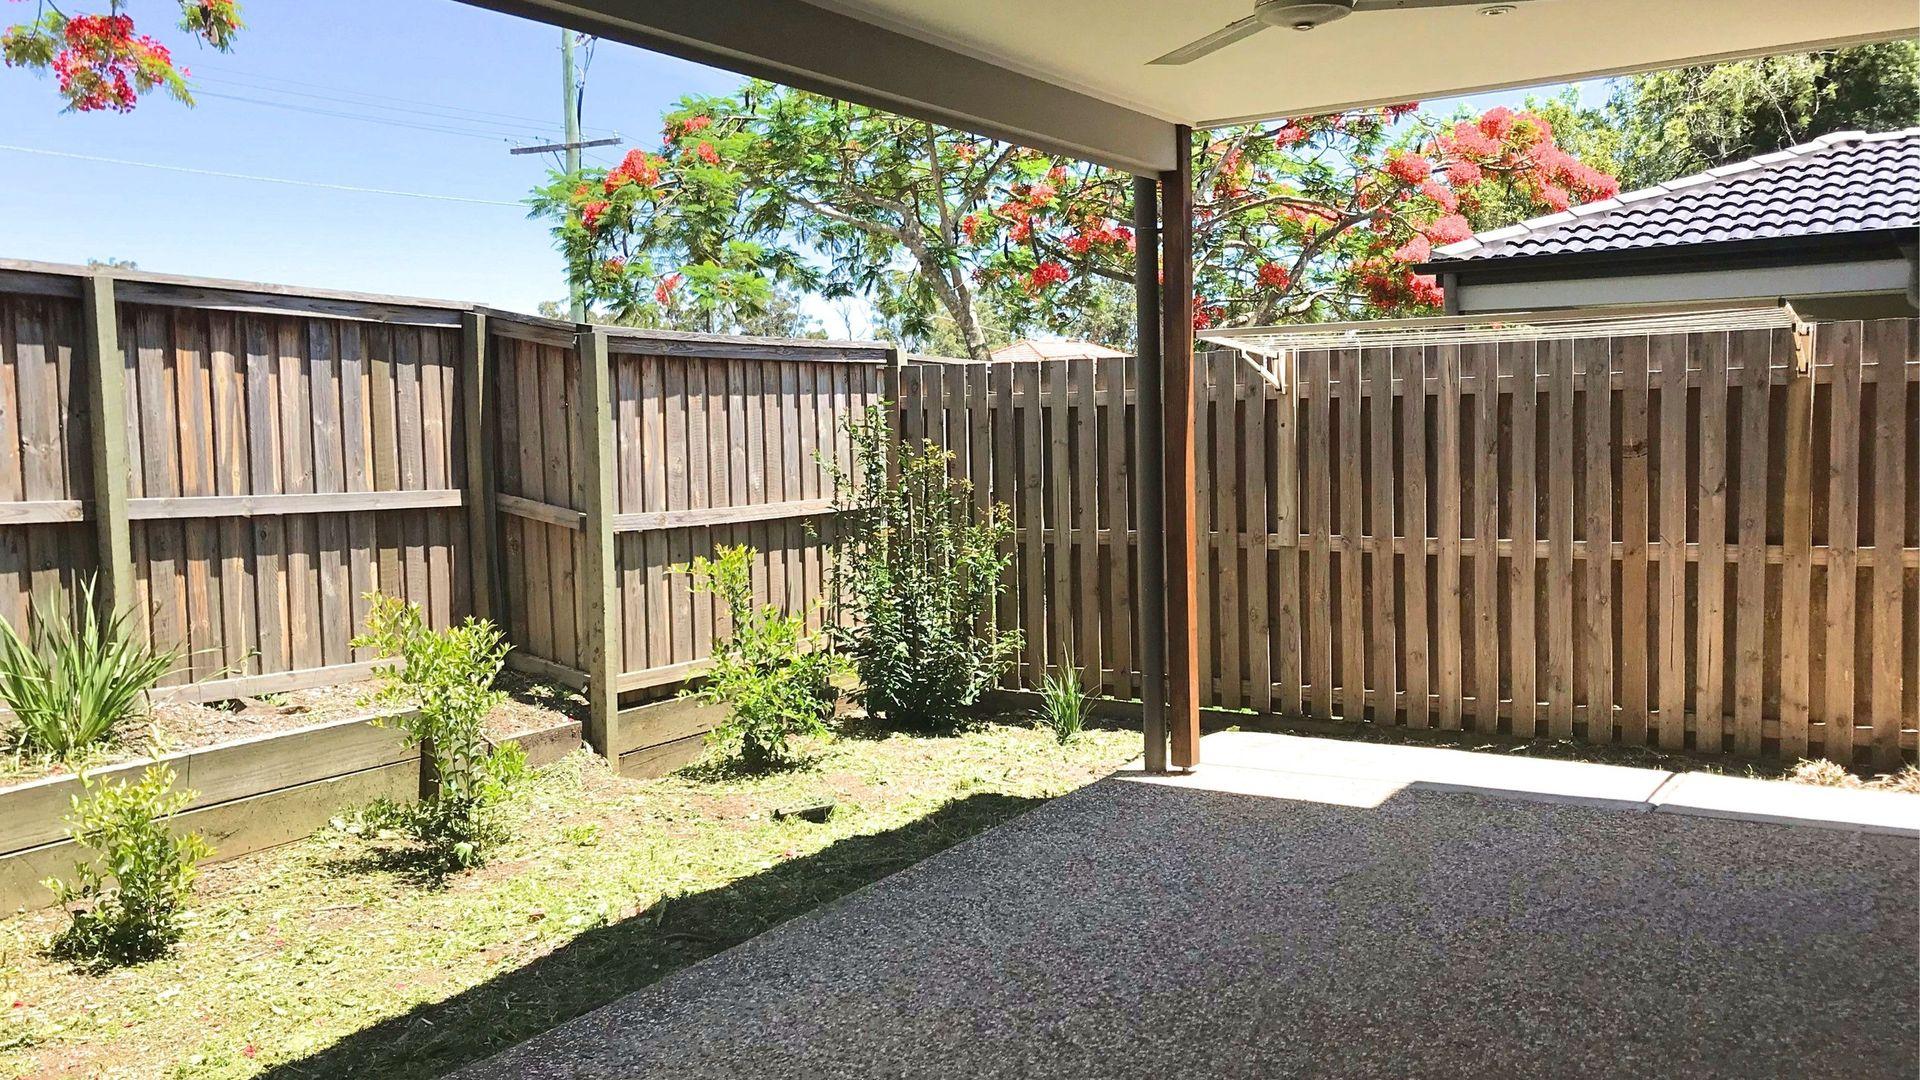 2/77 Menser Street, Calamvale QLD 4116, Image 2